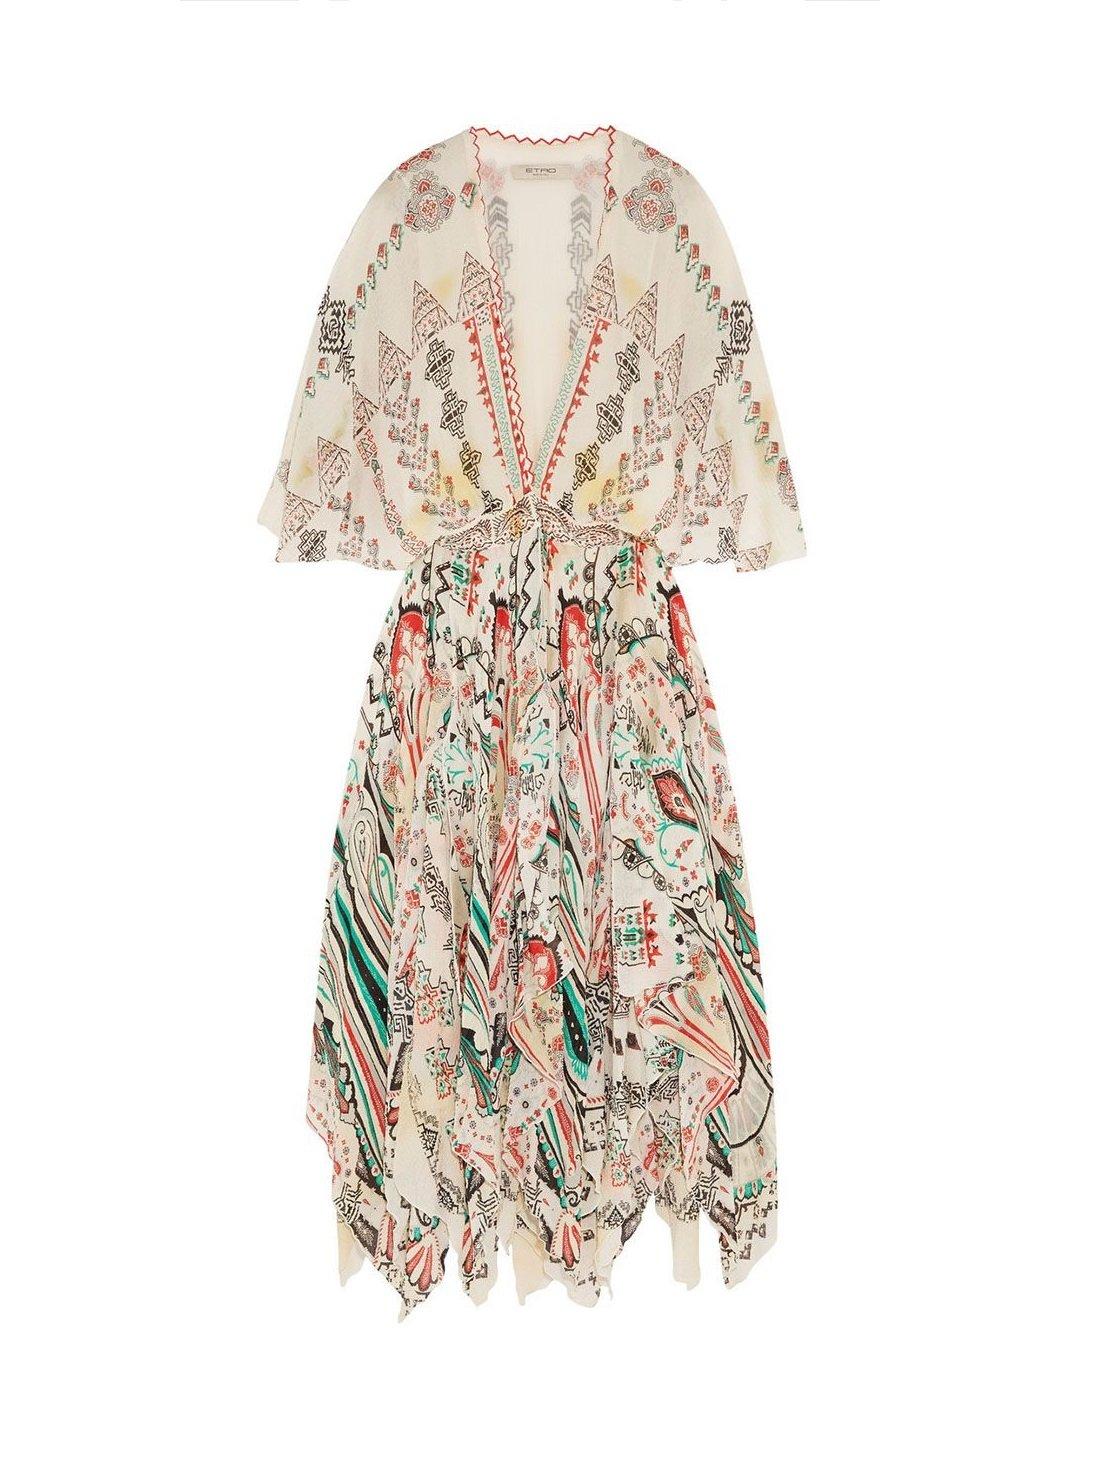 Wholesale Boho Dress for Spring